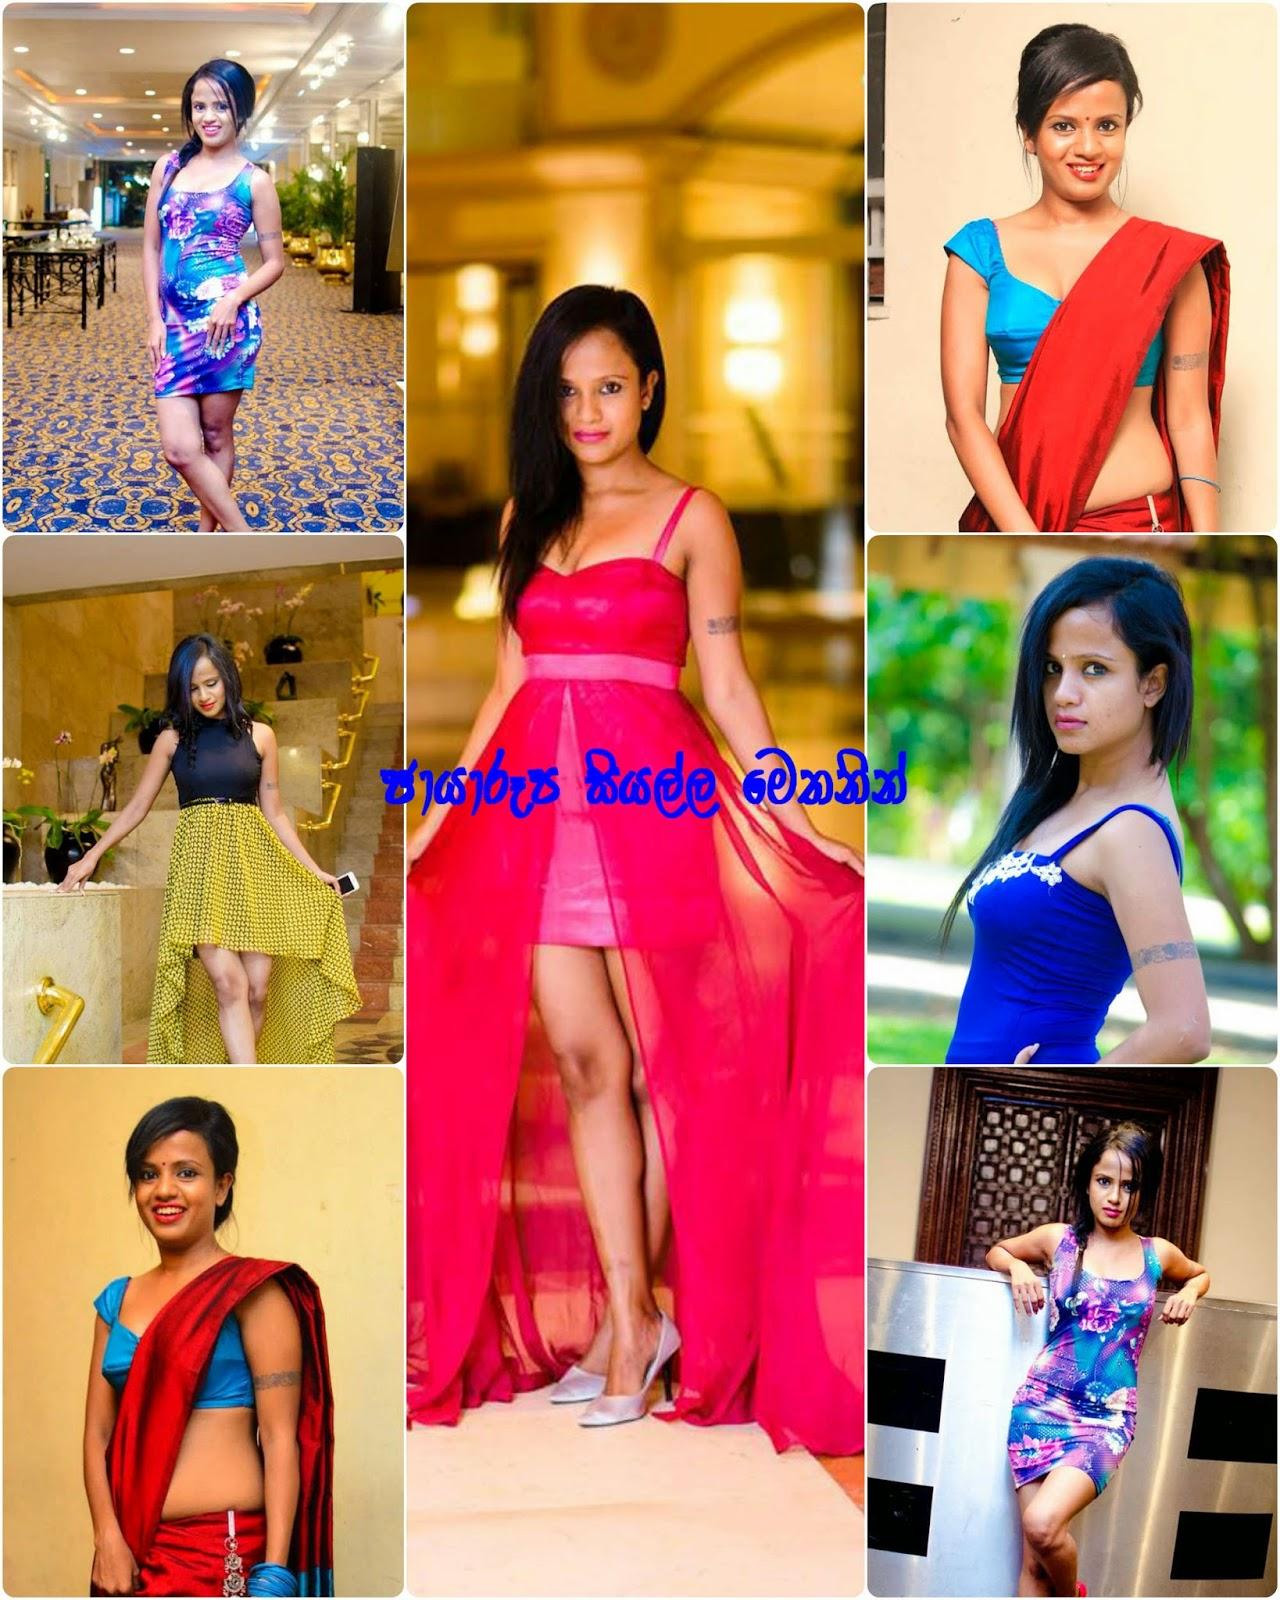 http://1.bp.blogspot.com/-jhynettNYrE/U30AQFHoaQI/AAAAAAAAi28/YZHUtAjFfyw/s1600/gayani.jpg